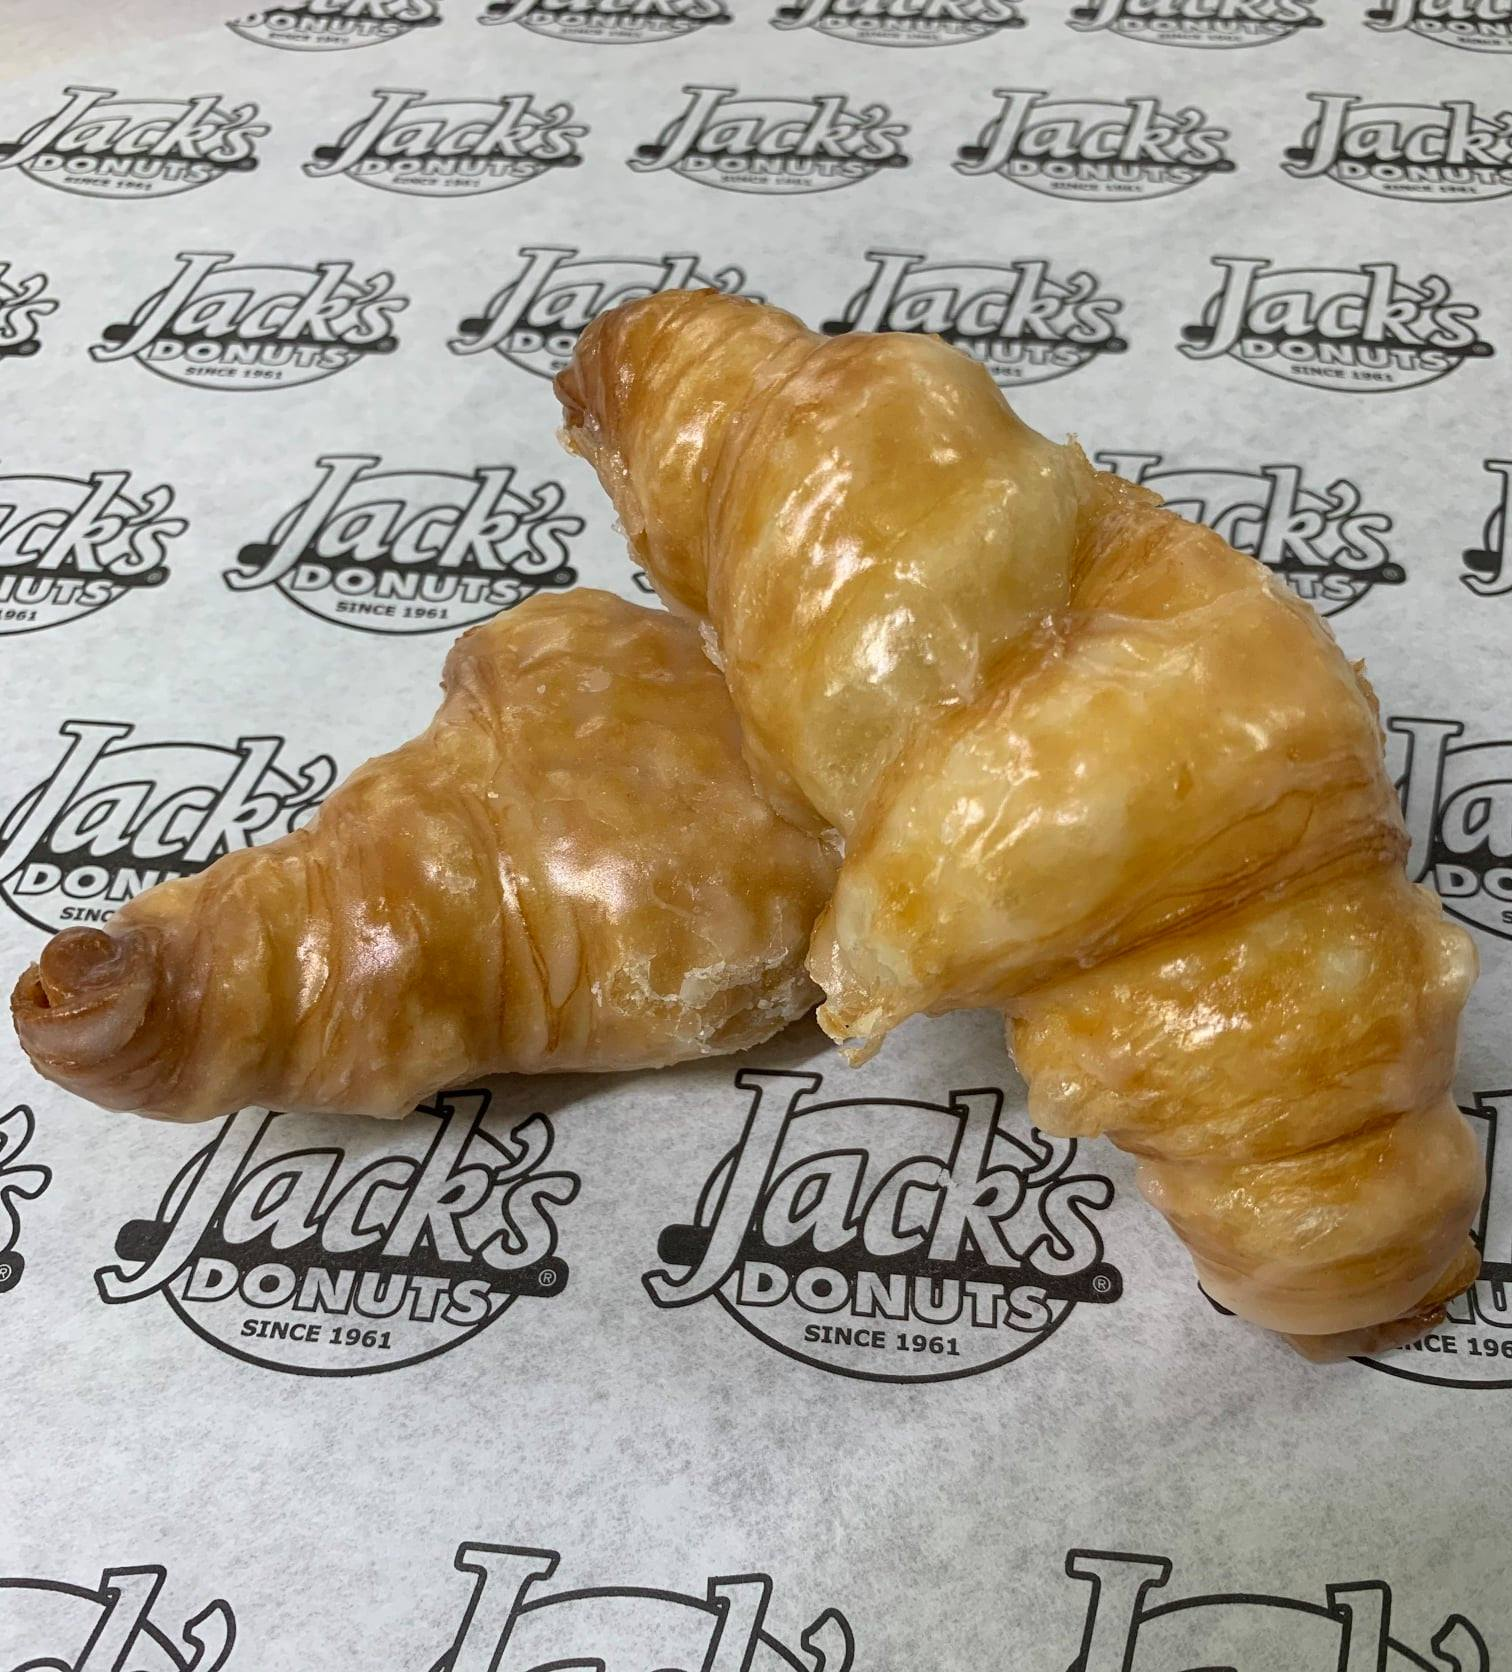 jacks donuts